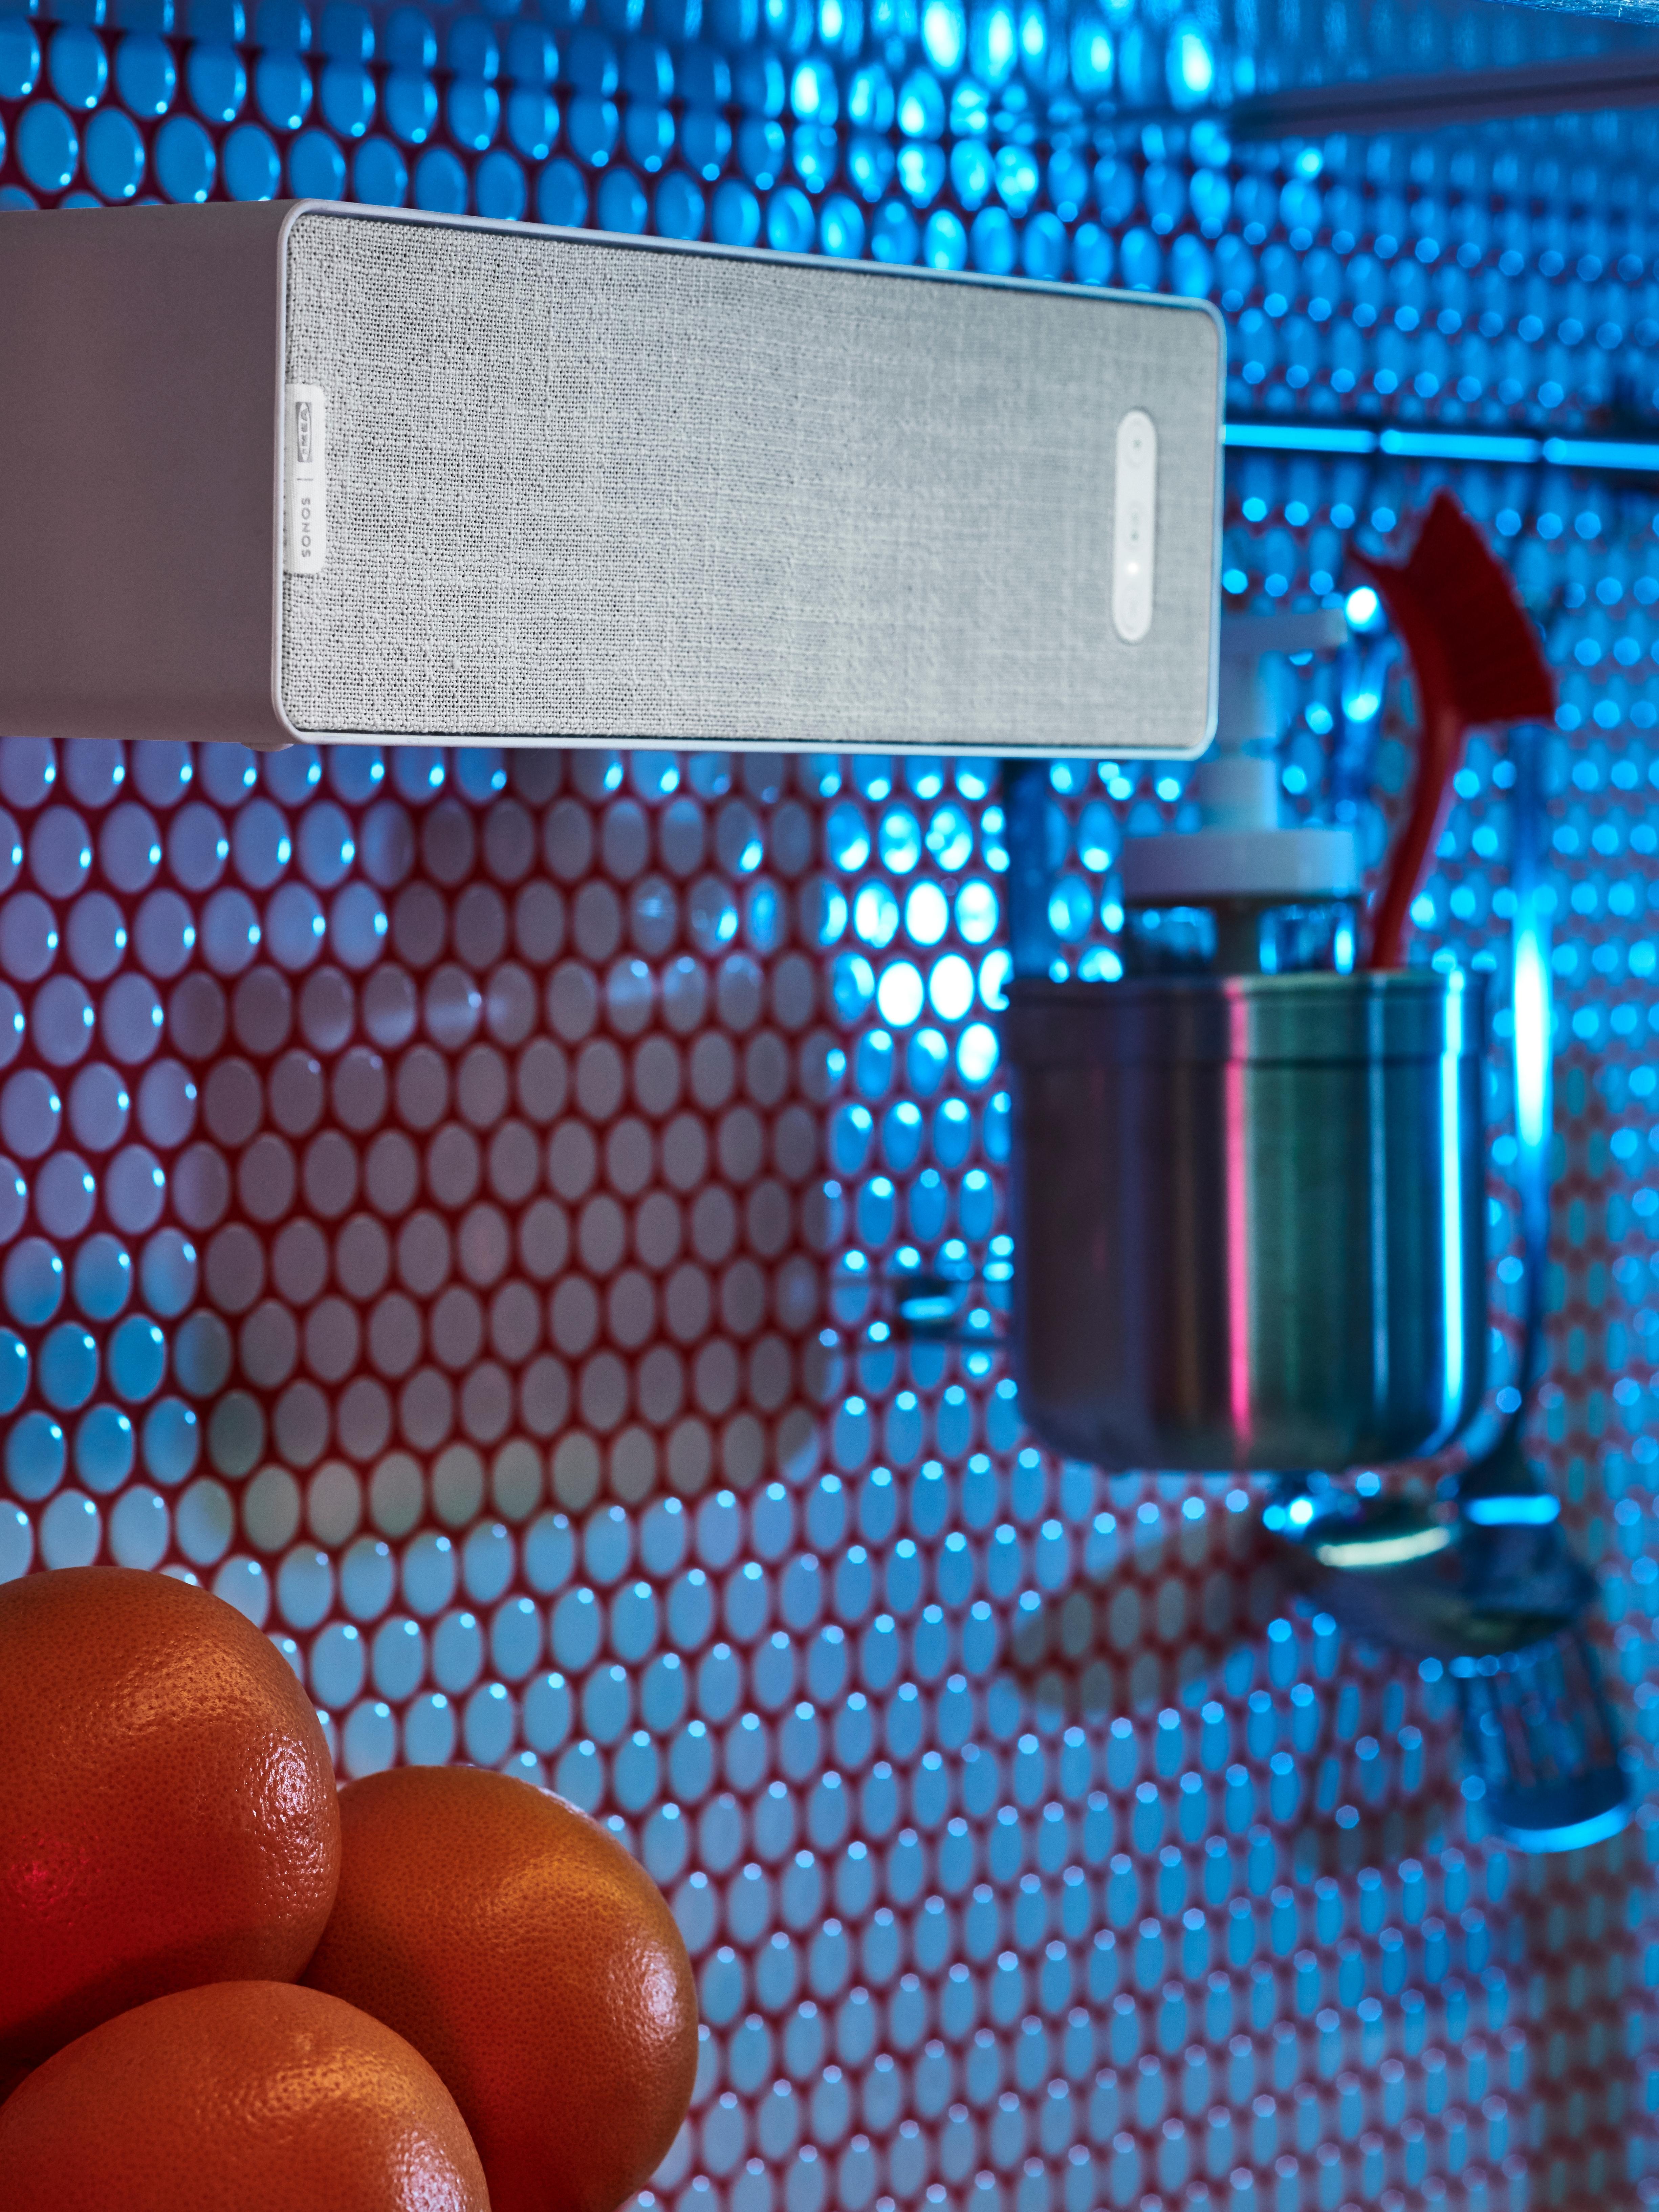 Beli SYMFONISK WiFi zvučnik polica visi na KUNGSFORS šini od nerđajućeg čelika na kuhinjskom zidu s okruglim pločicama.